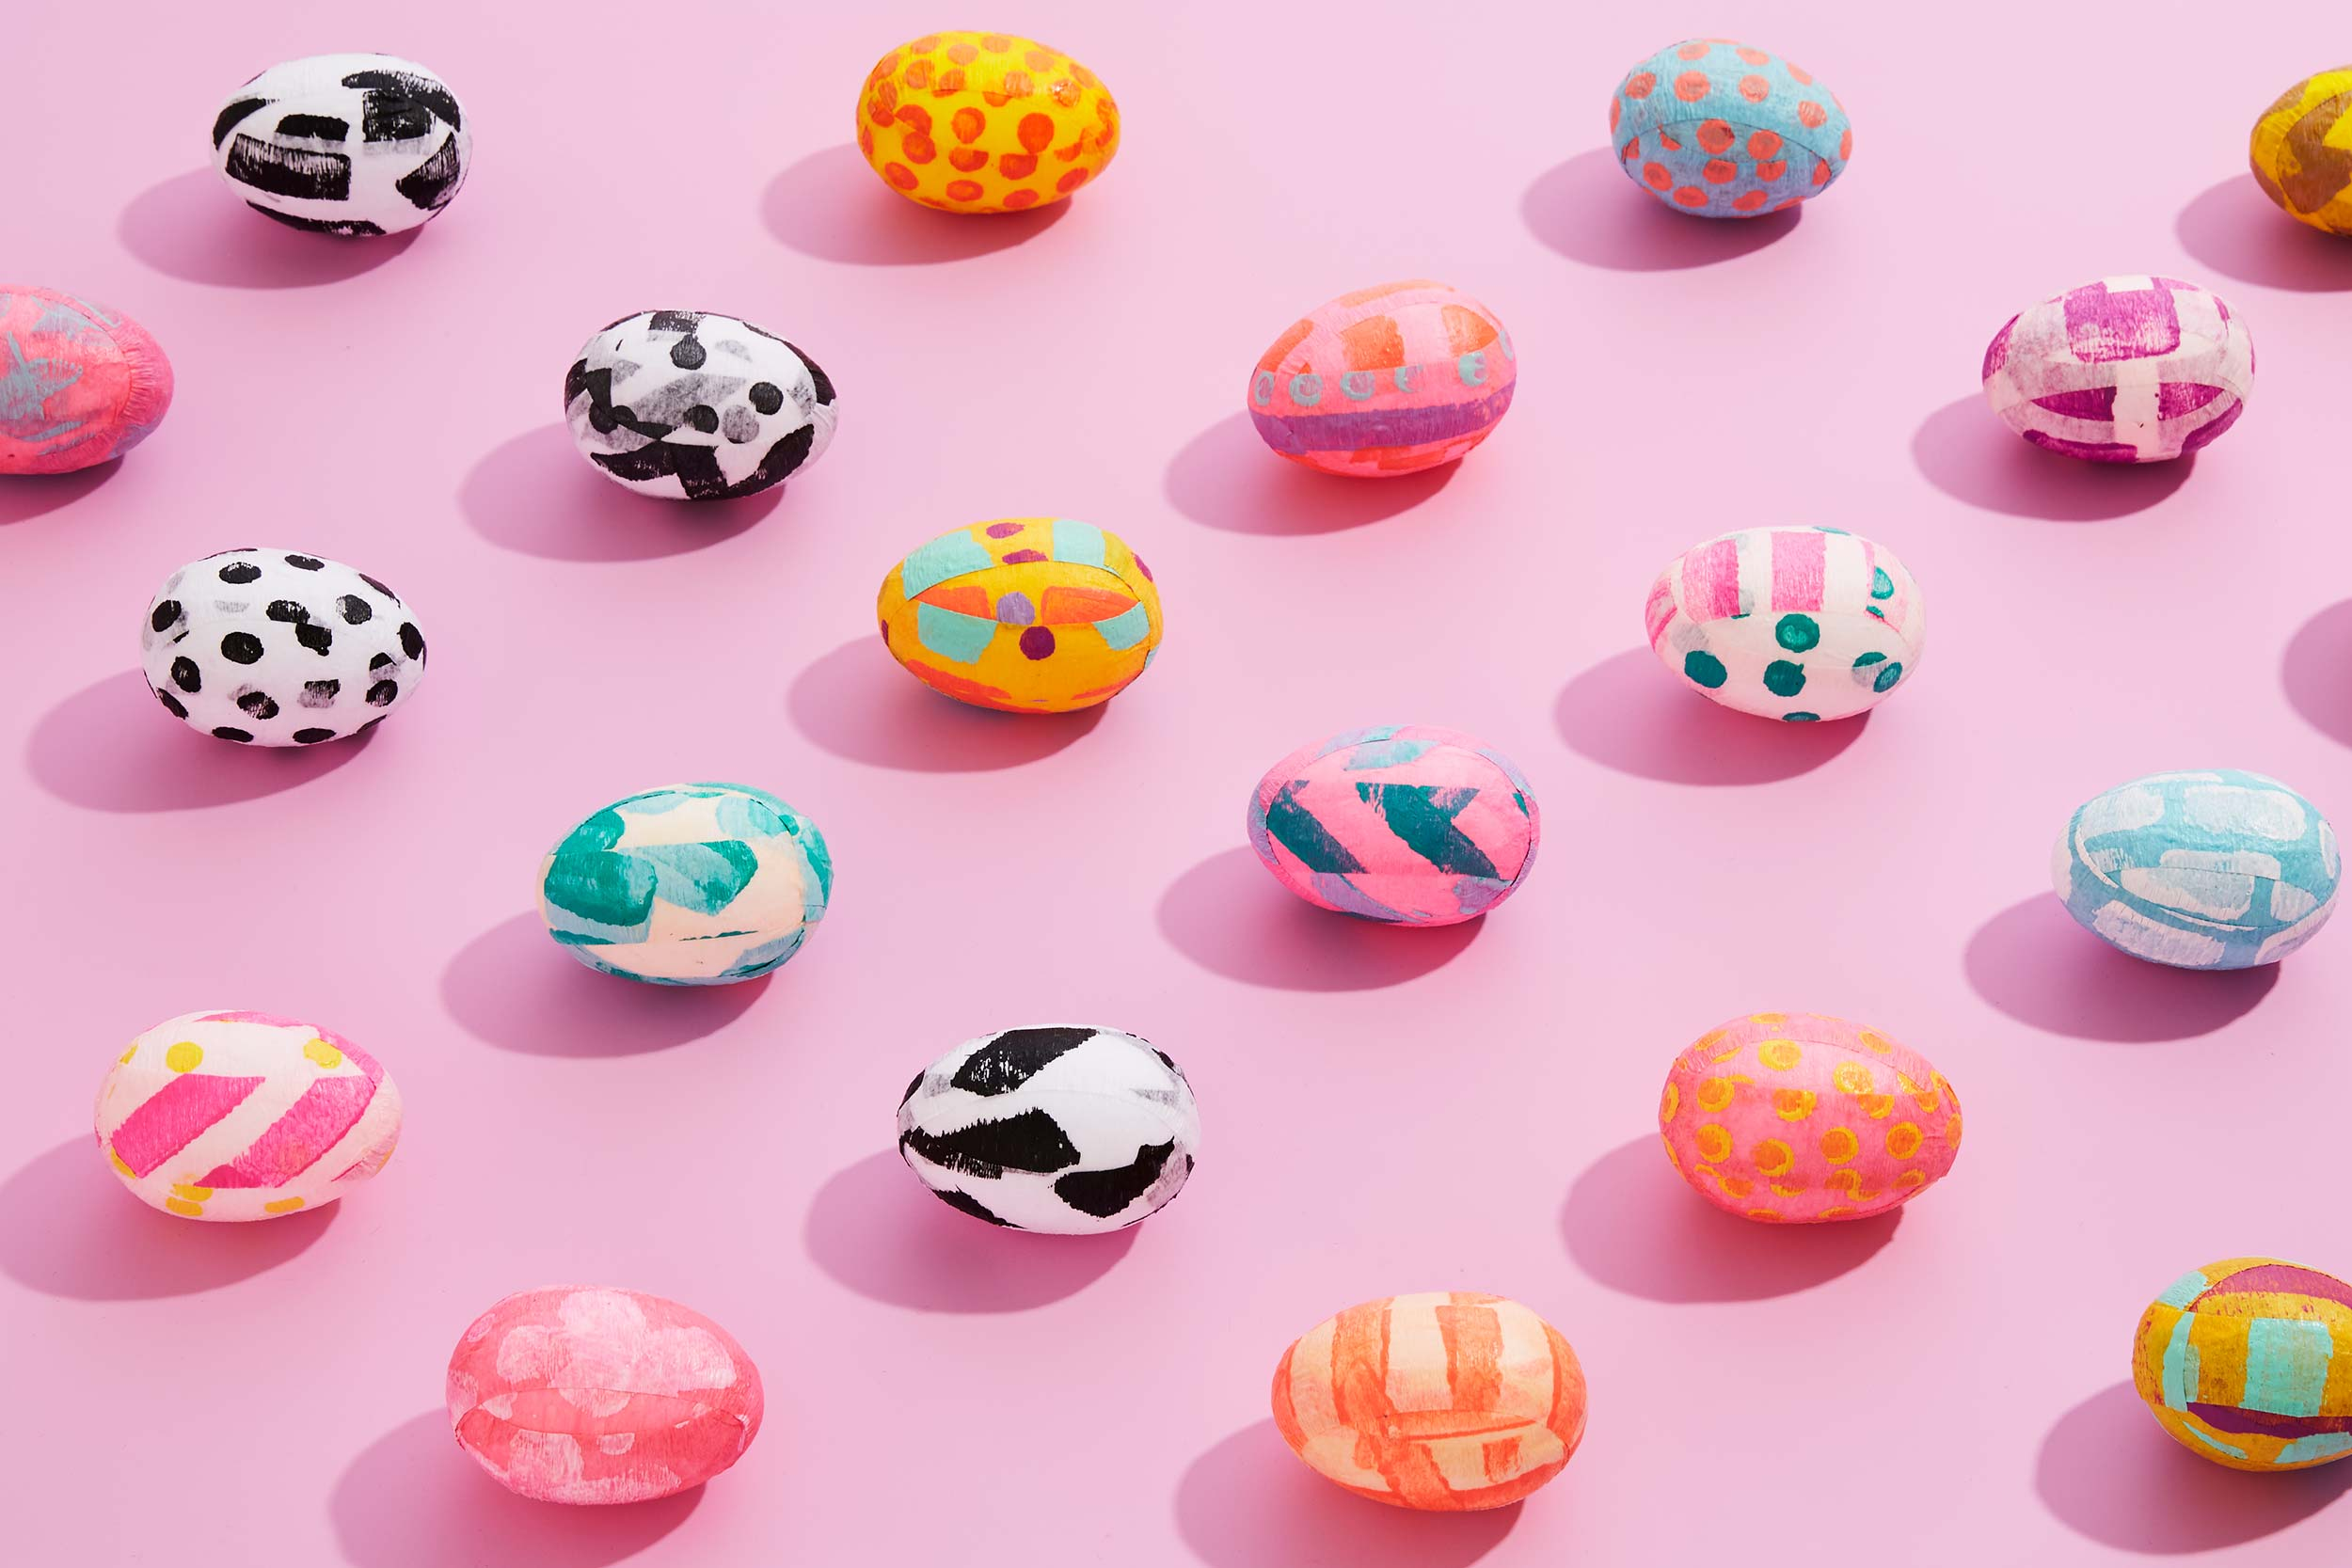 Domino-Collage-Eggs-thussfarrell_0082.jpg